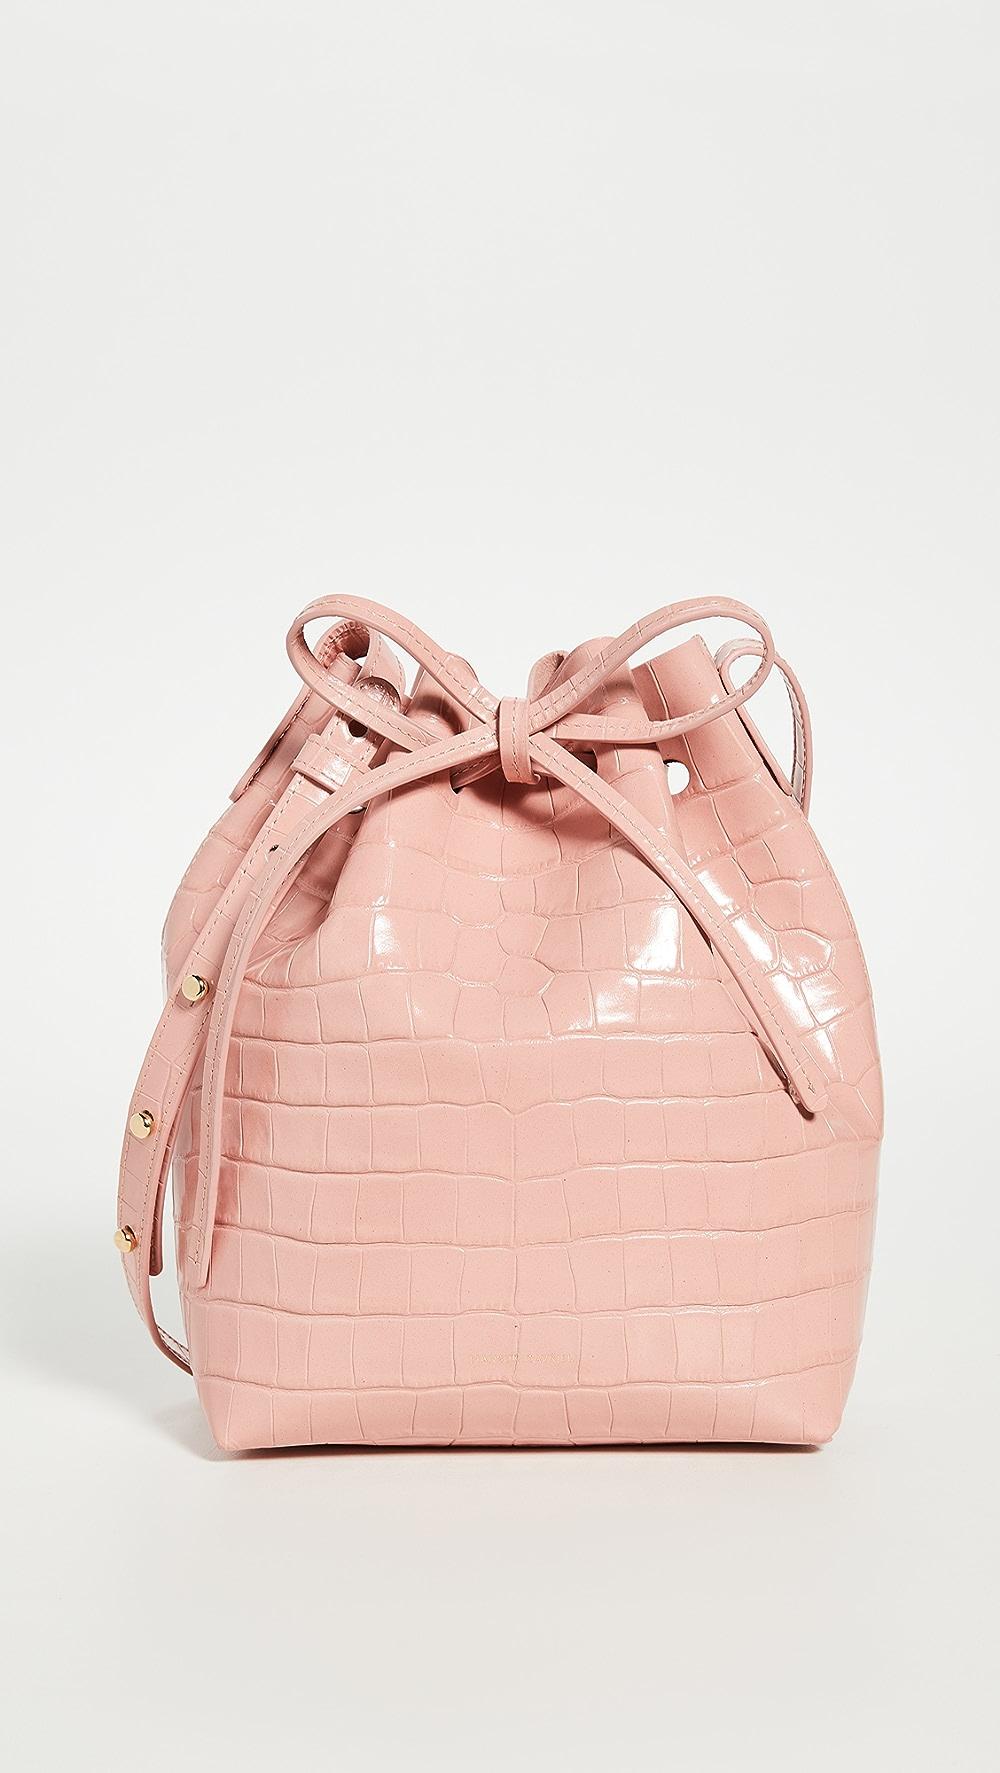 Just Mansur Gavriel - Mini Bucket Bag At All Costs